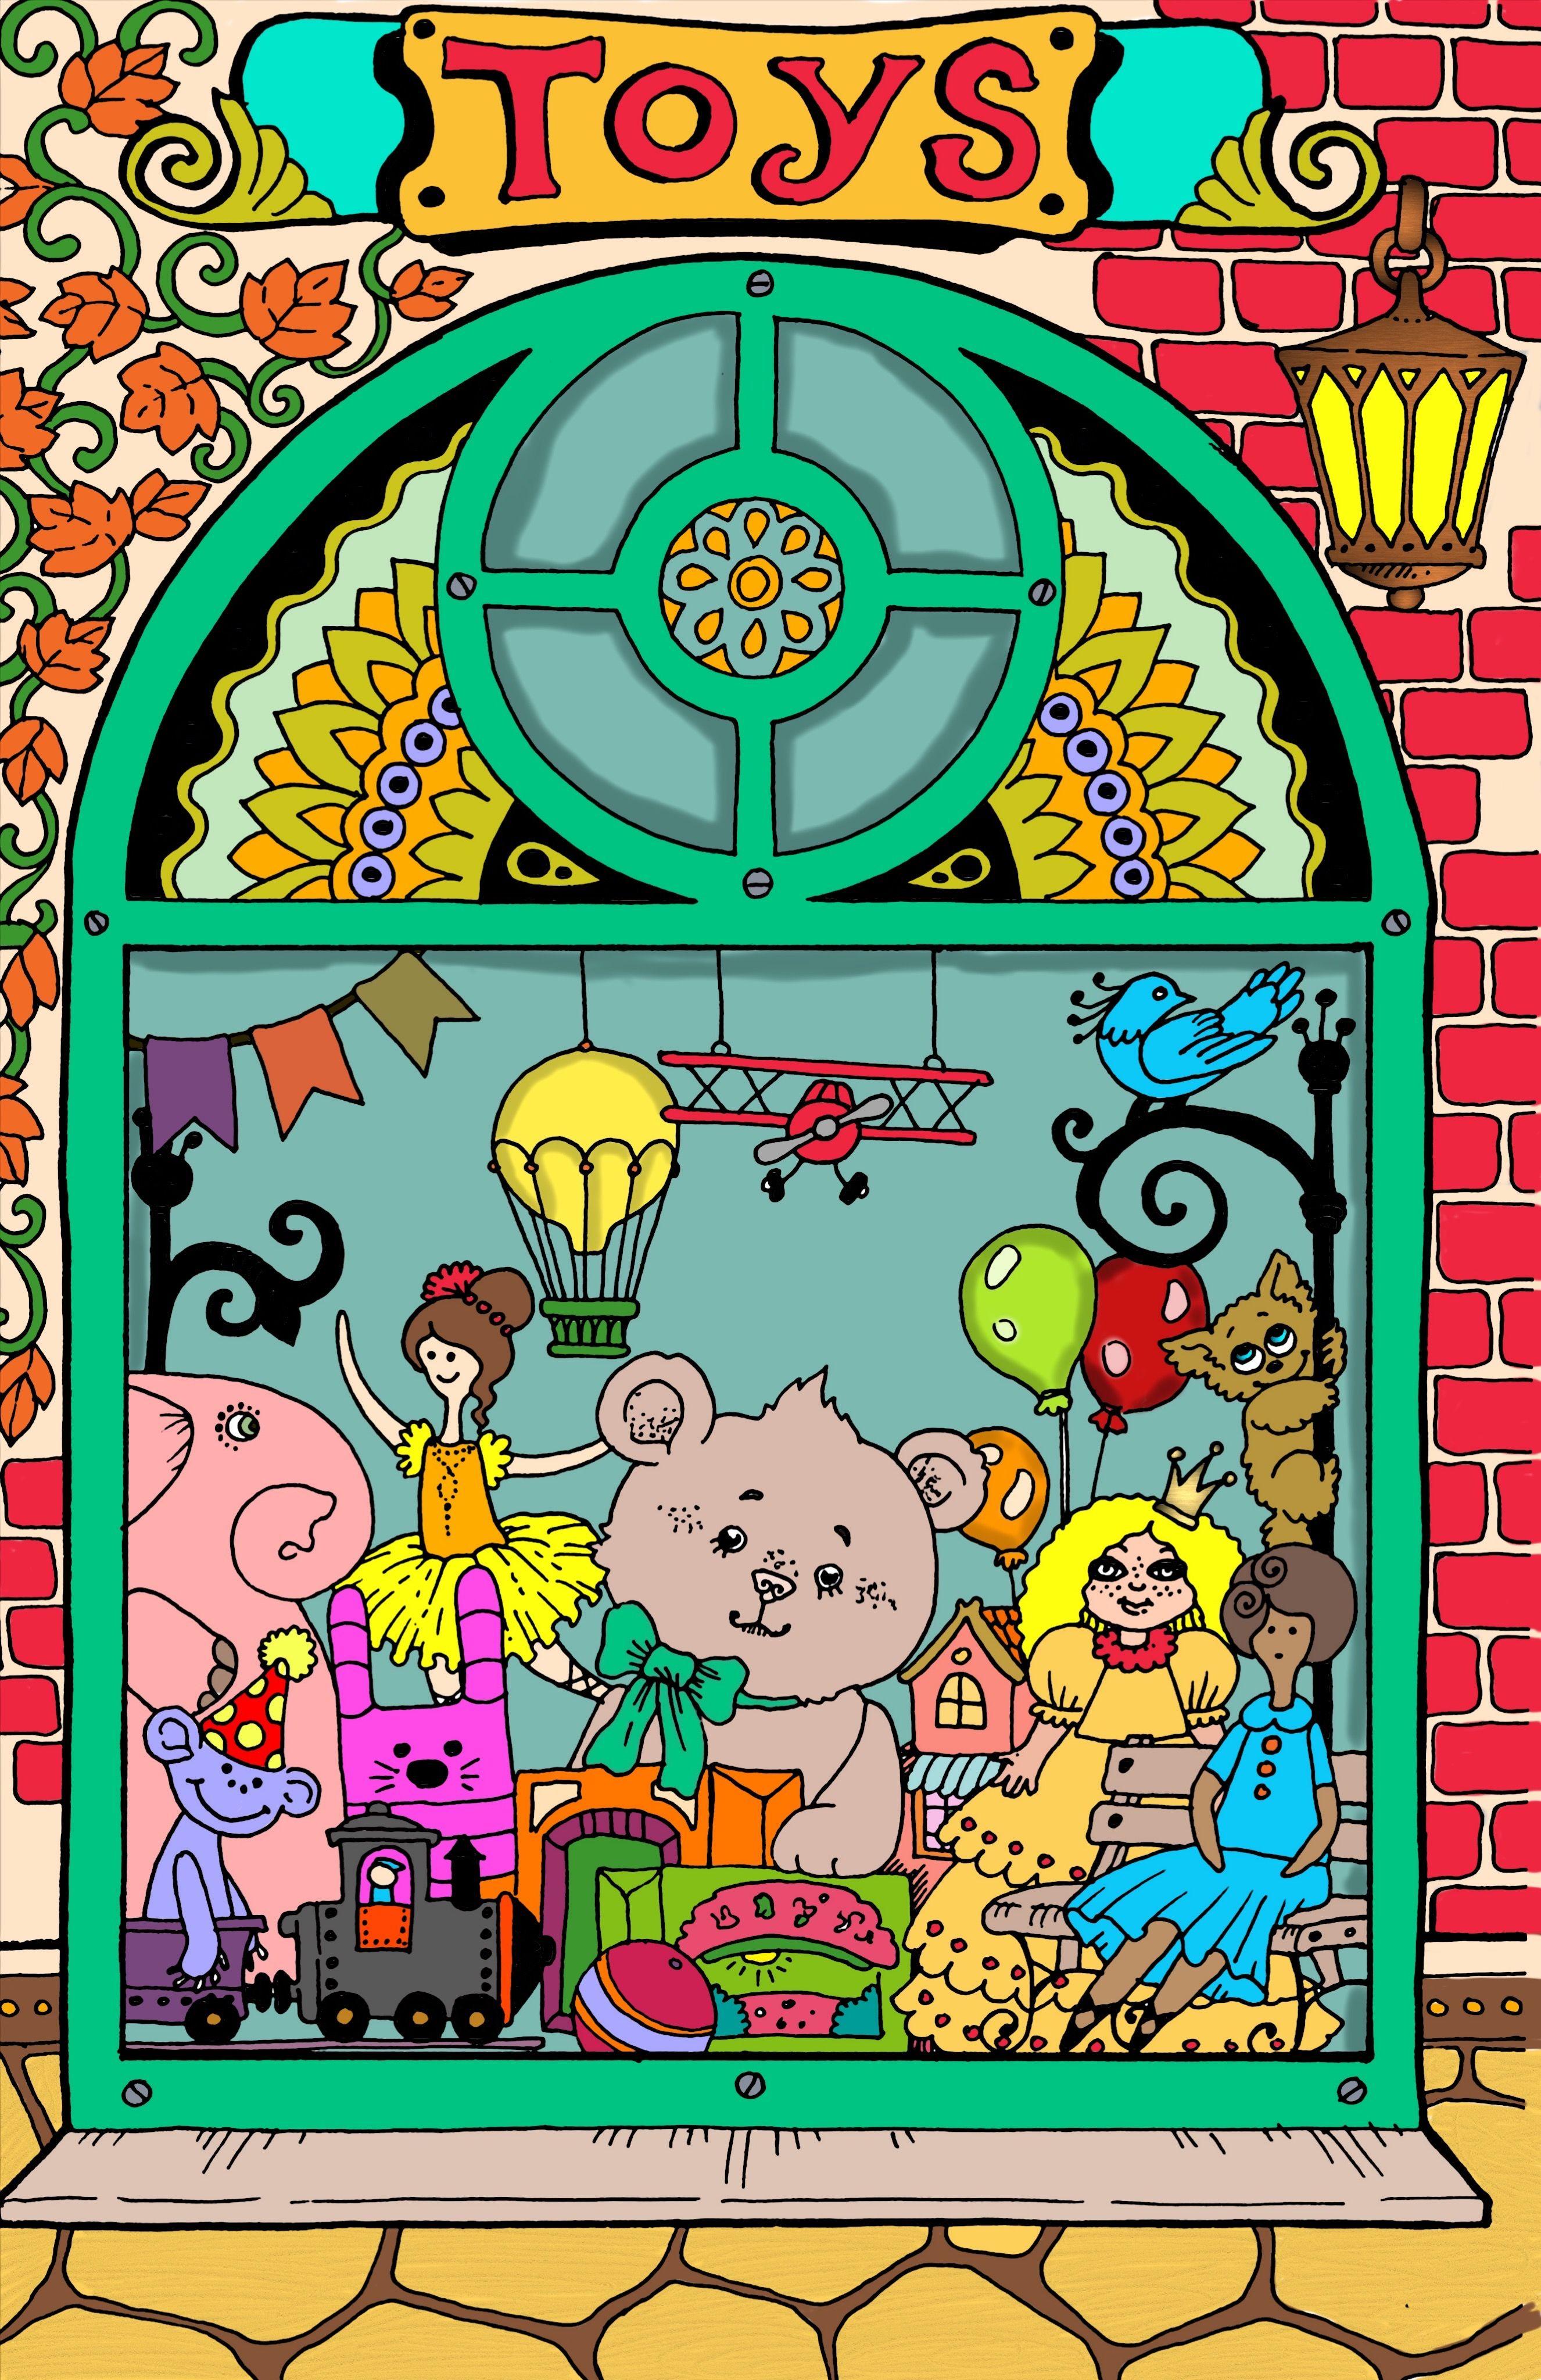 Art By Tatiana Stolova Bogema Book Nice Little Town Digitally Colored Using Pigment App On Ipad Pro Art Coloring Book Pages Coloring Books